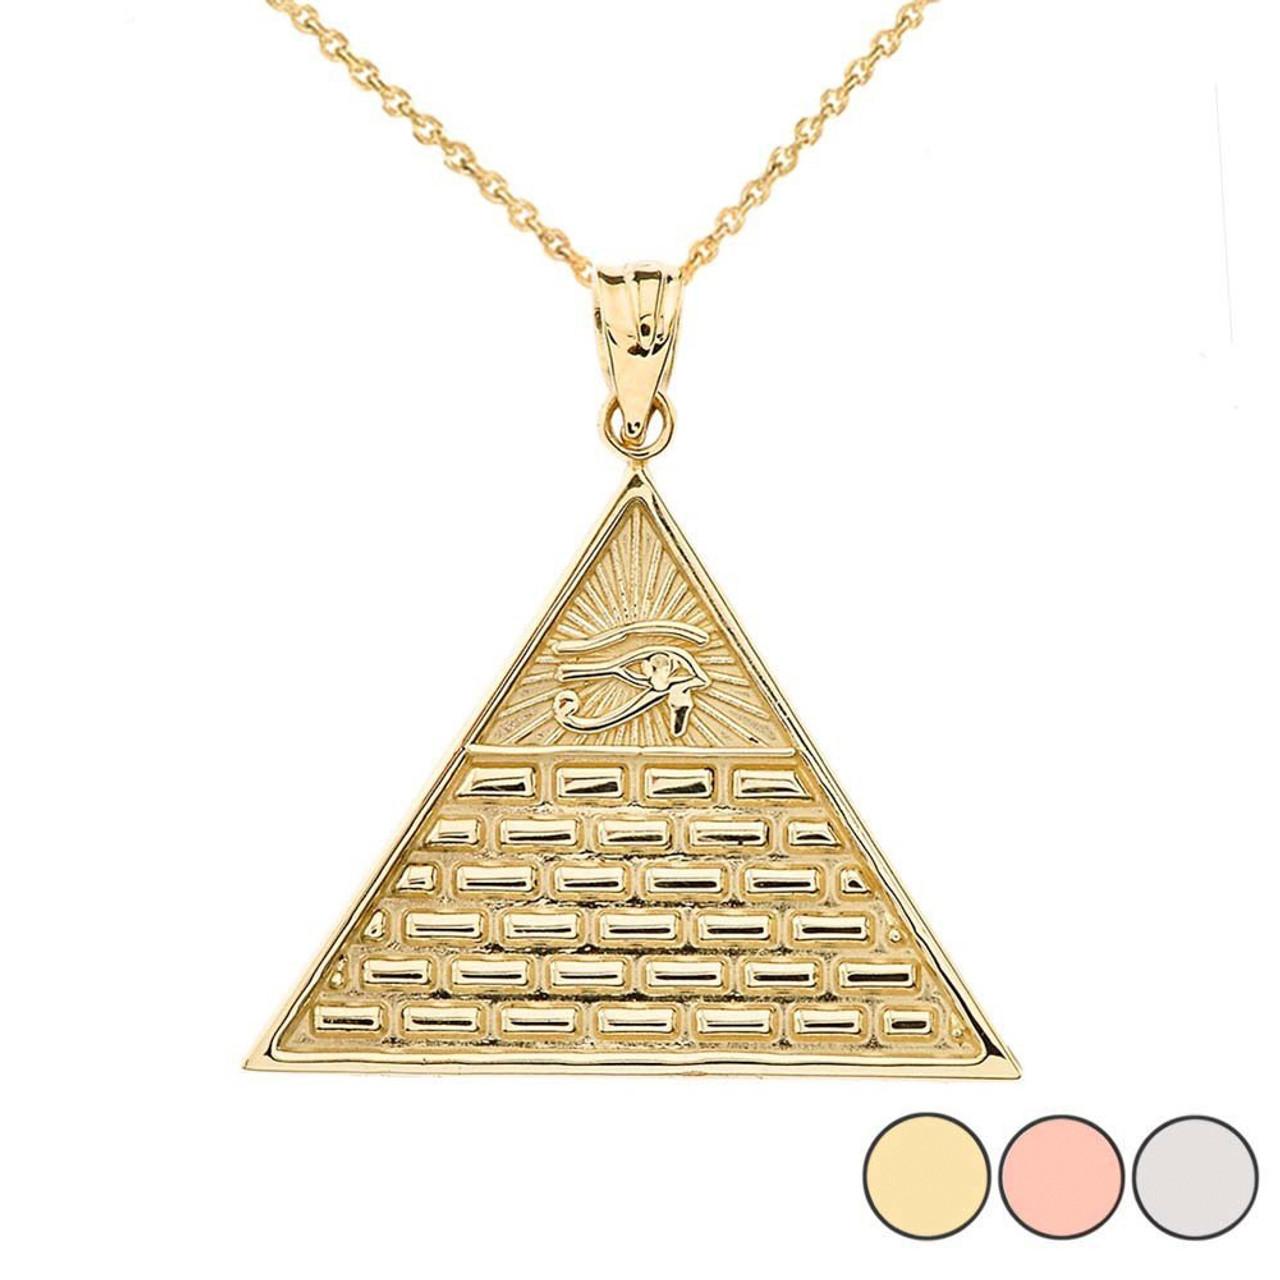 10k White Gold Egyptian Pyramid With King Tutankhamun Pendant Necklace Fashion Necklaces & Pendants